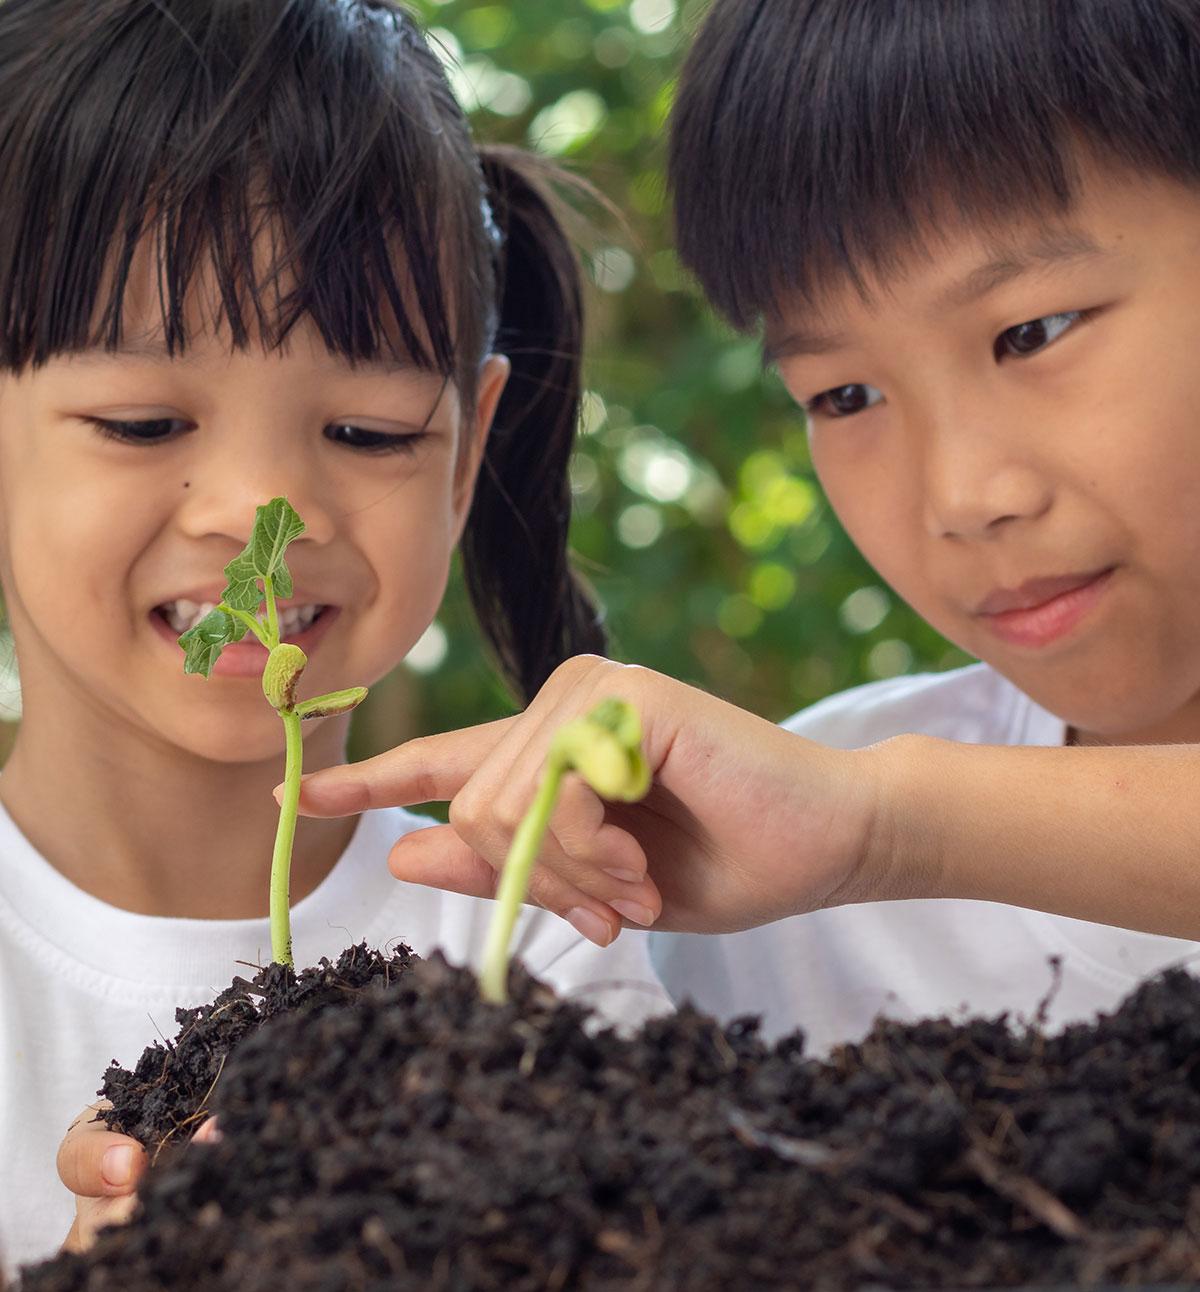 B4School FUN - Alphabet Adventure - G is for Garden